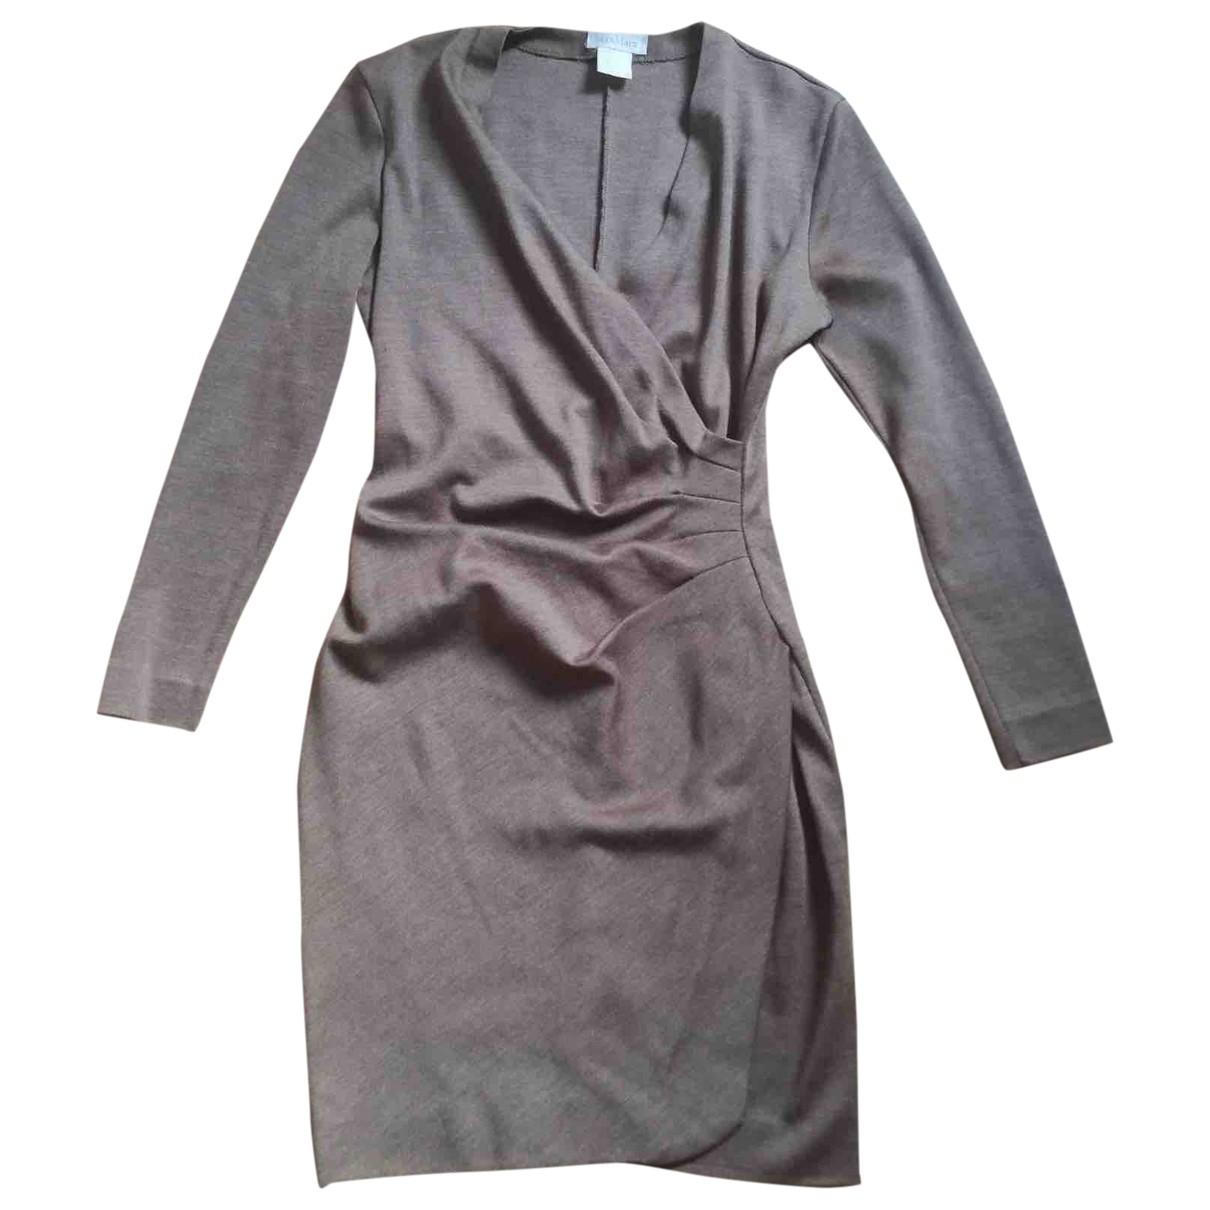 Max Mara \N Camel Wool dress for Women 42 IT